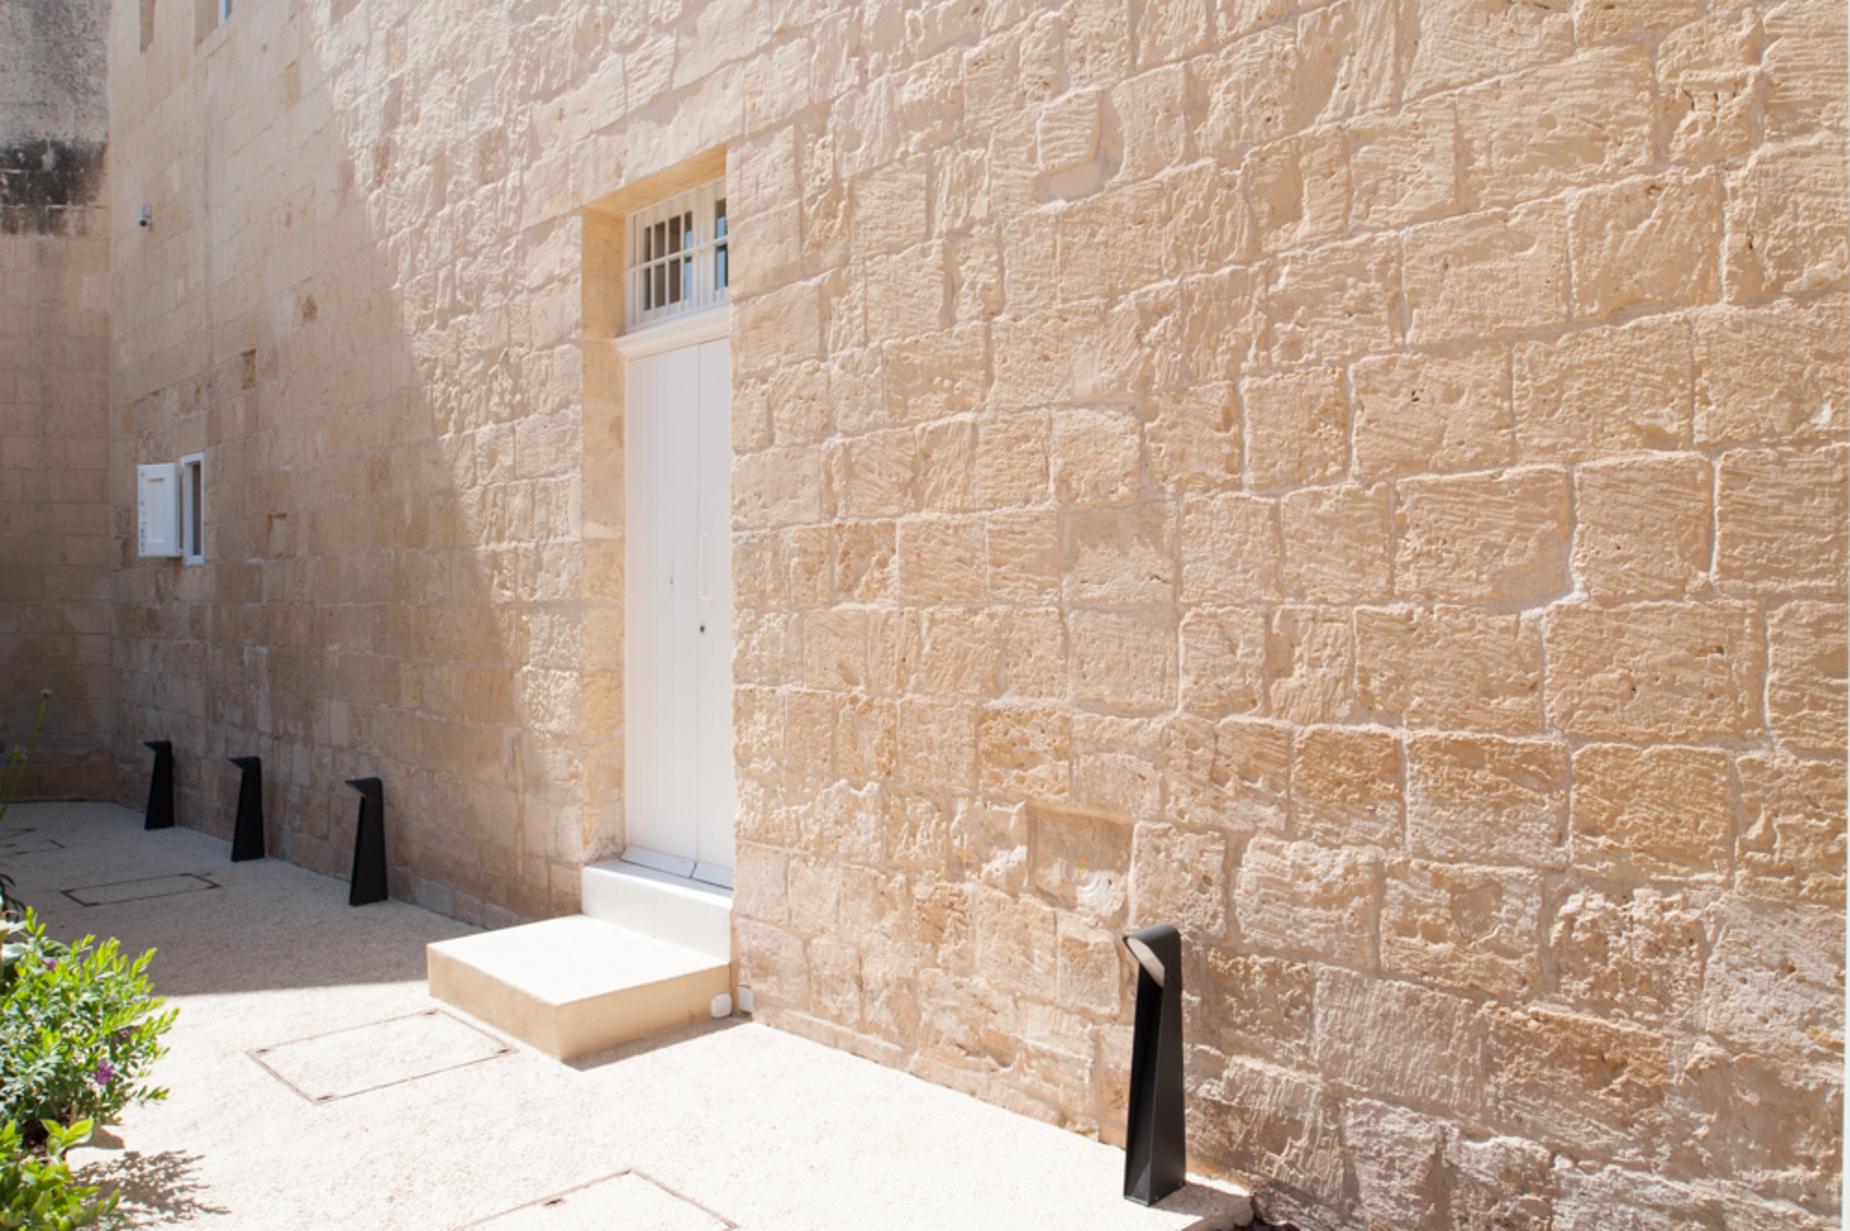 4 bed Town House For Sale in Balzan, Balzan - thumb 10